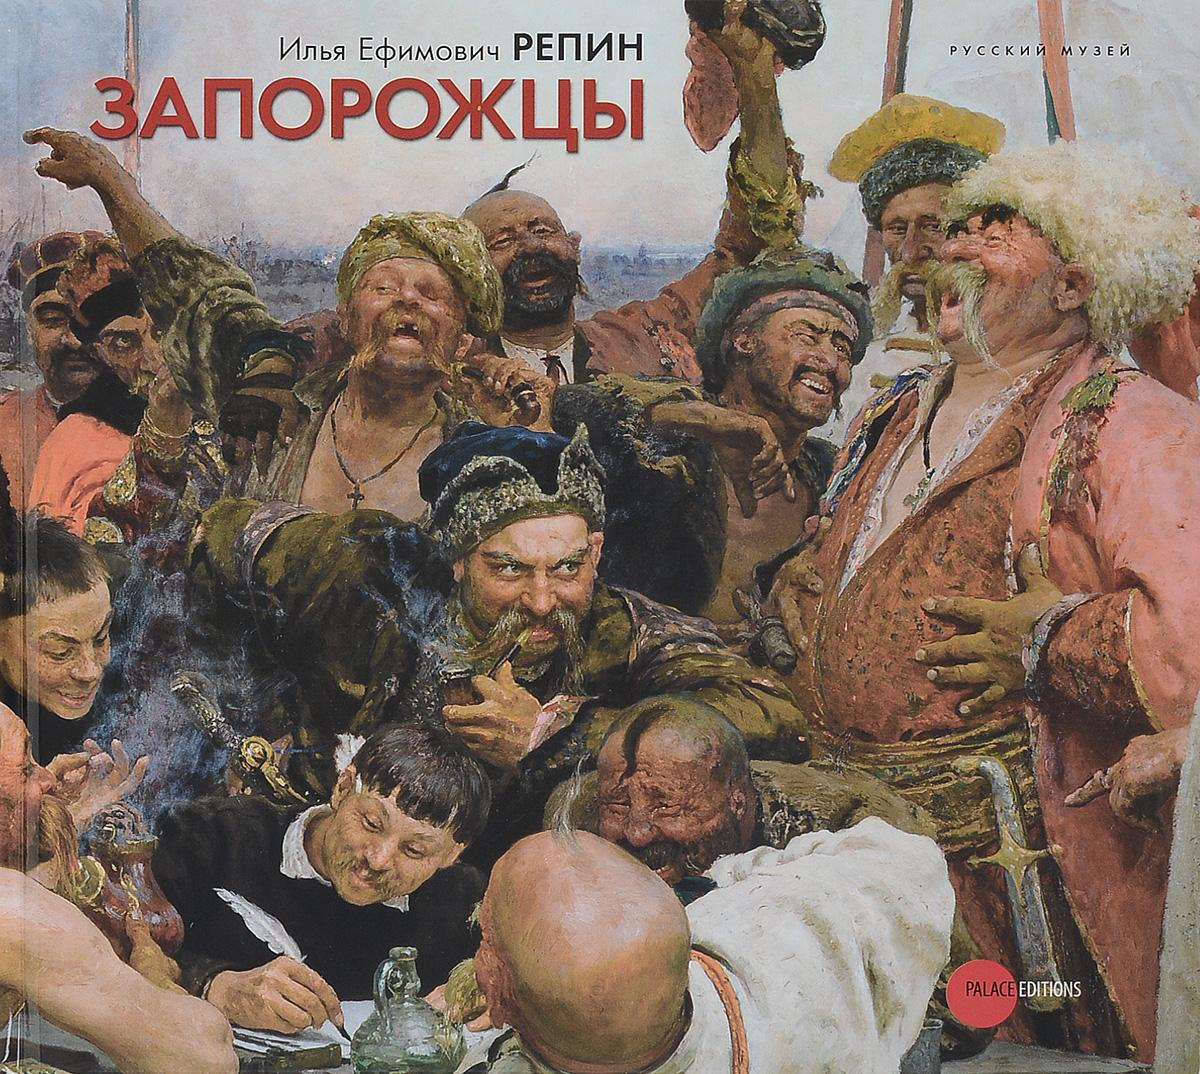 Е. Петрова, И. Шувалова Илья Ефимович Репин. Запорожцы